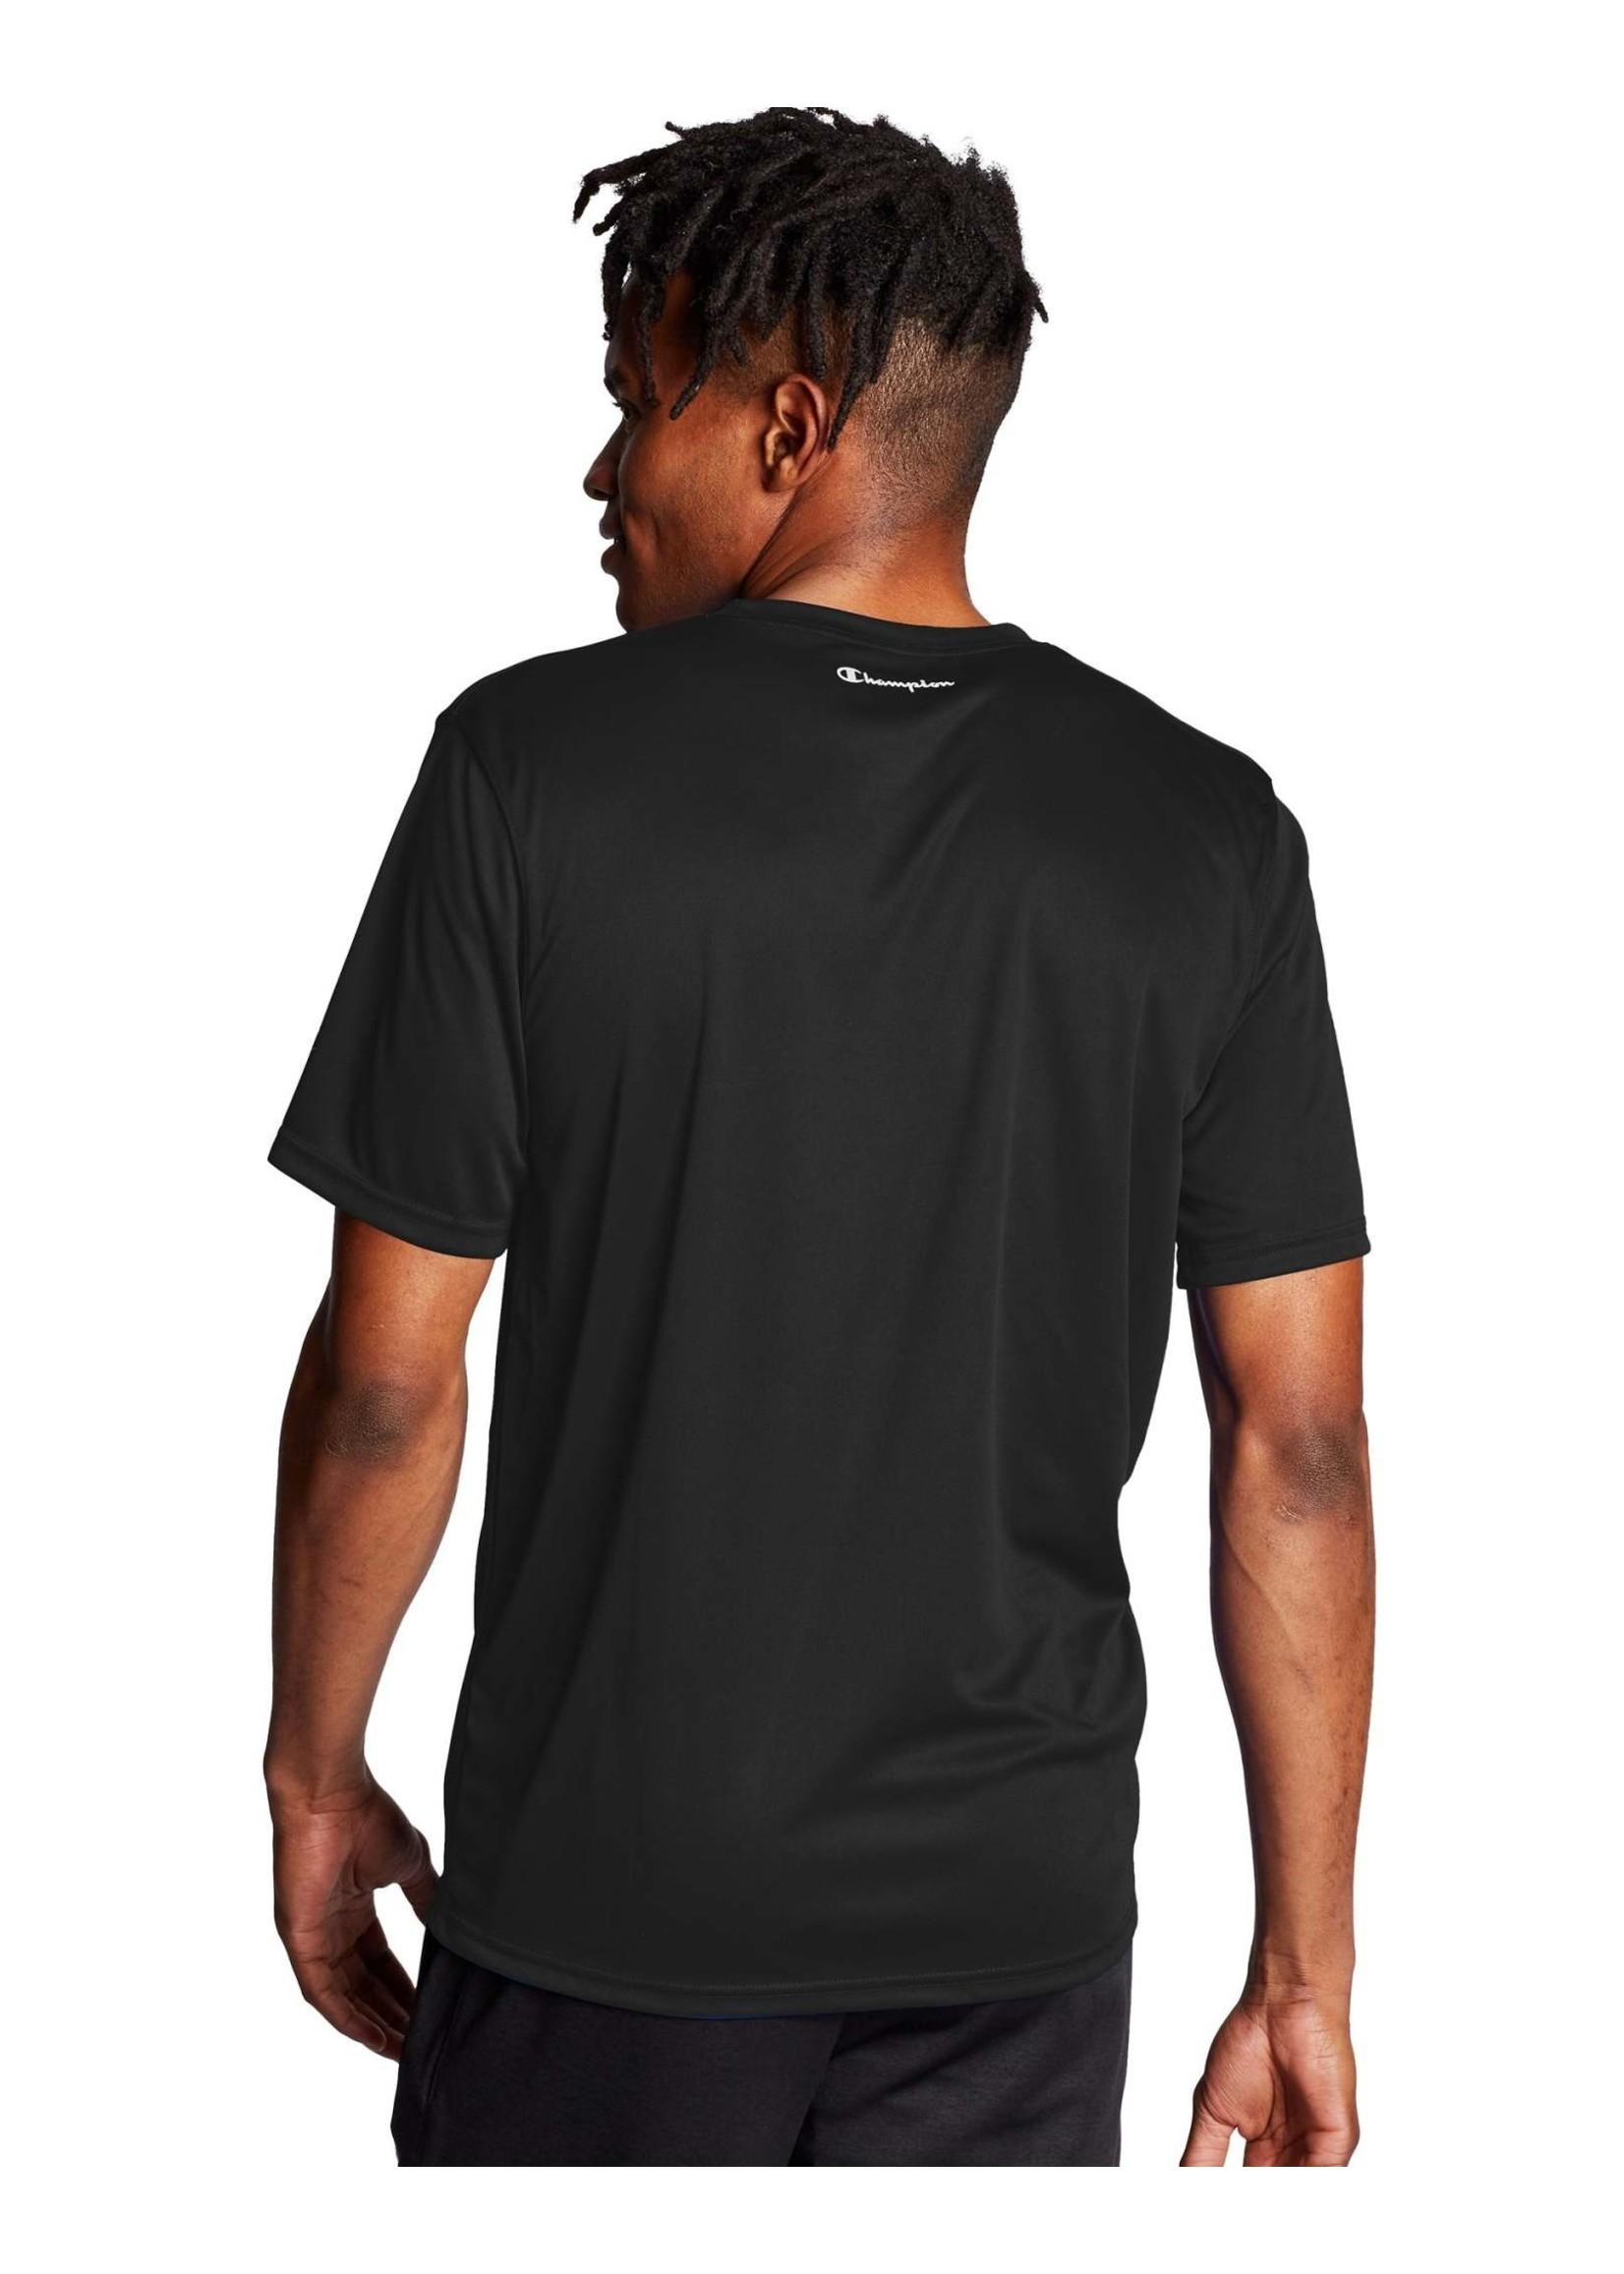 CHAMPION T-shirt Double Dry Core